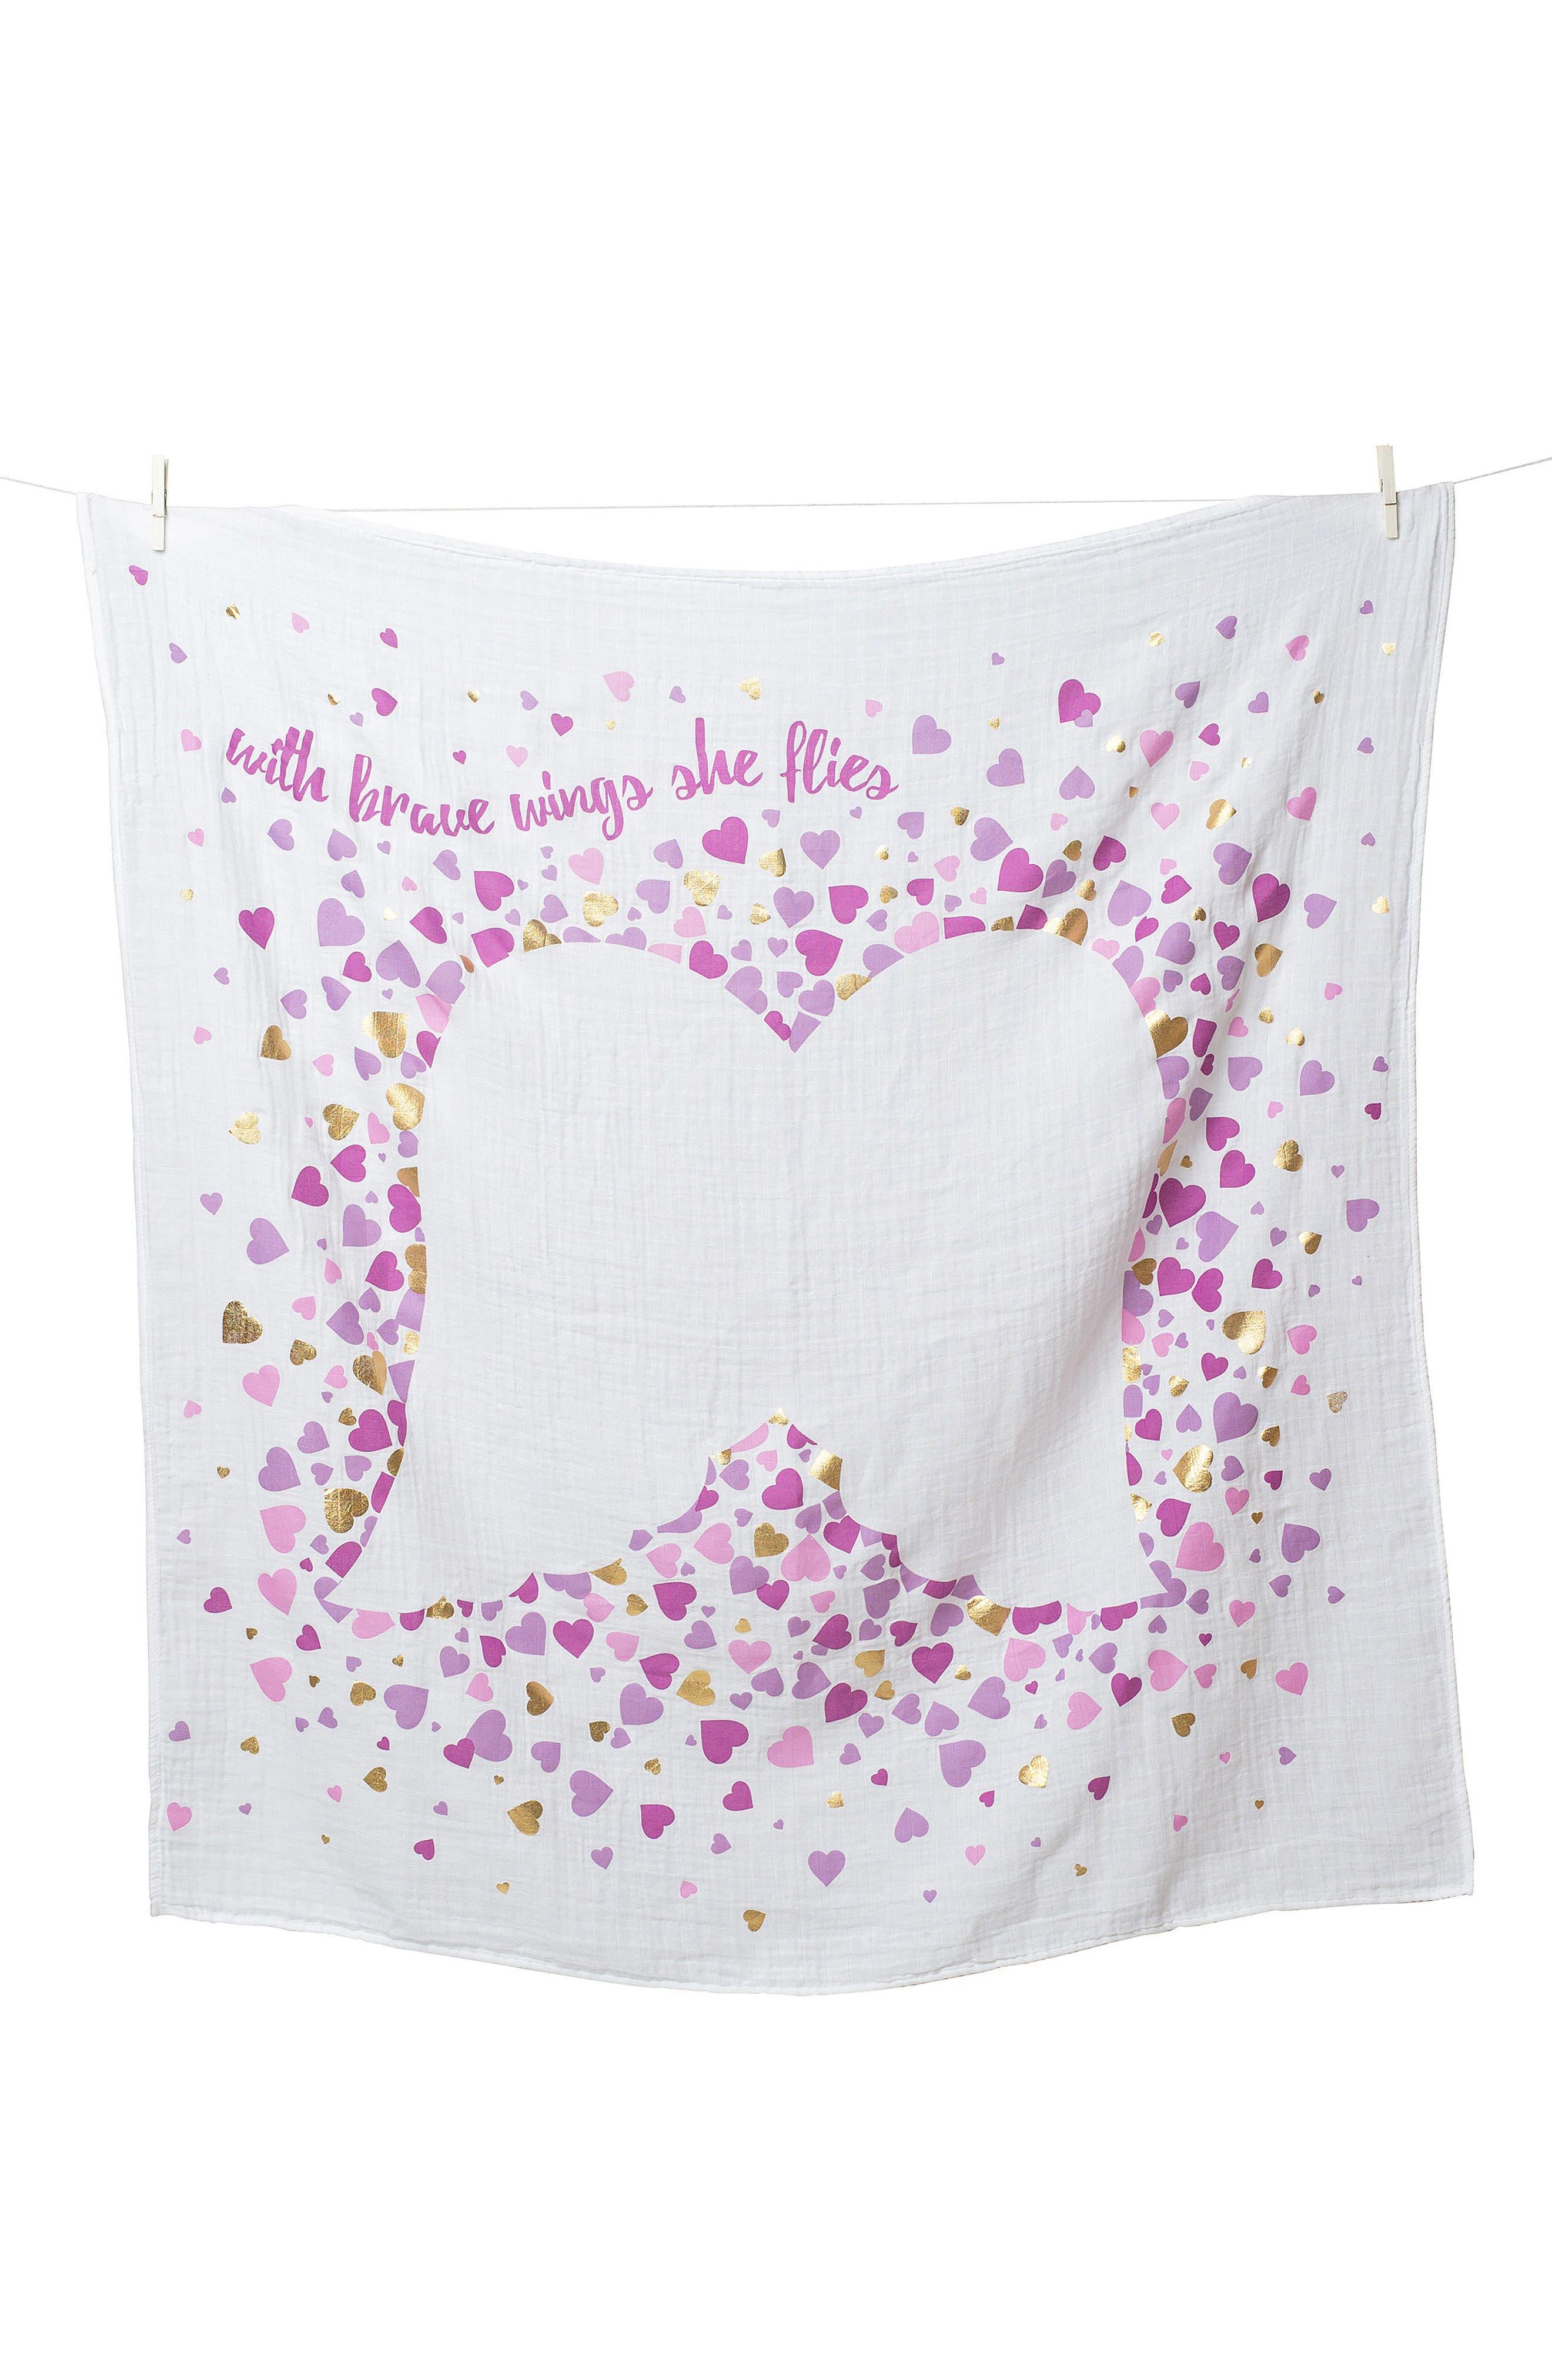 Lulujo Baby's First Year - With Brave Wings She Flies Muslin Blanket & Milestone Card Set (Baby Girls)